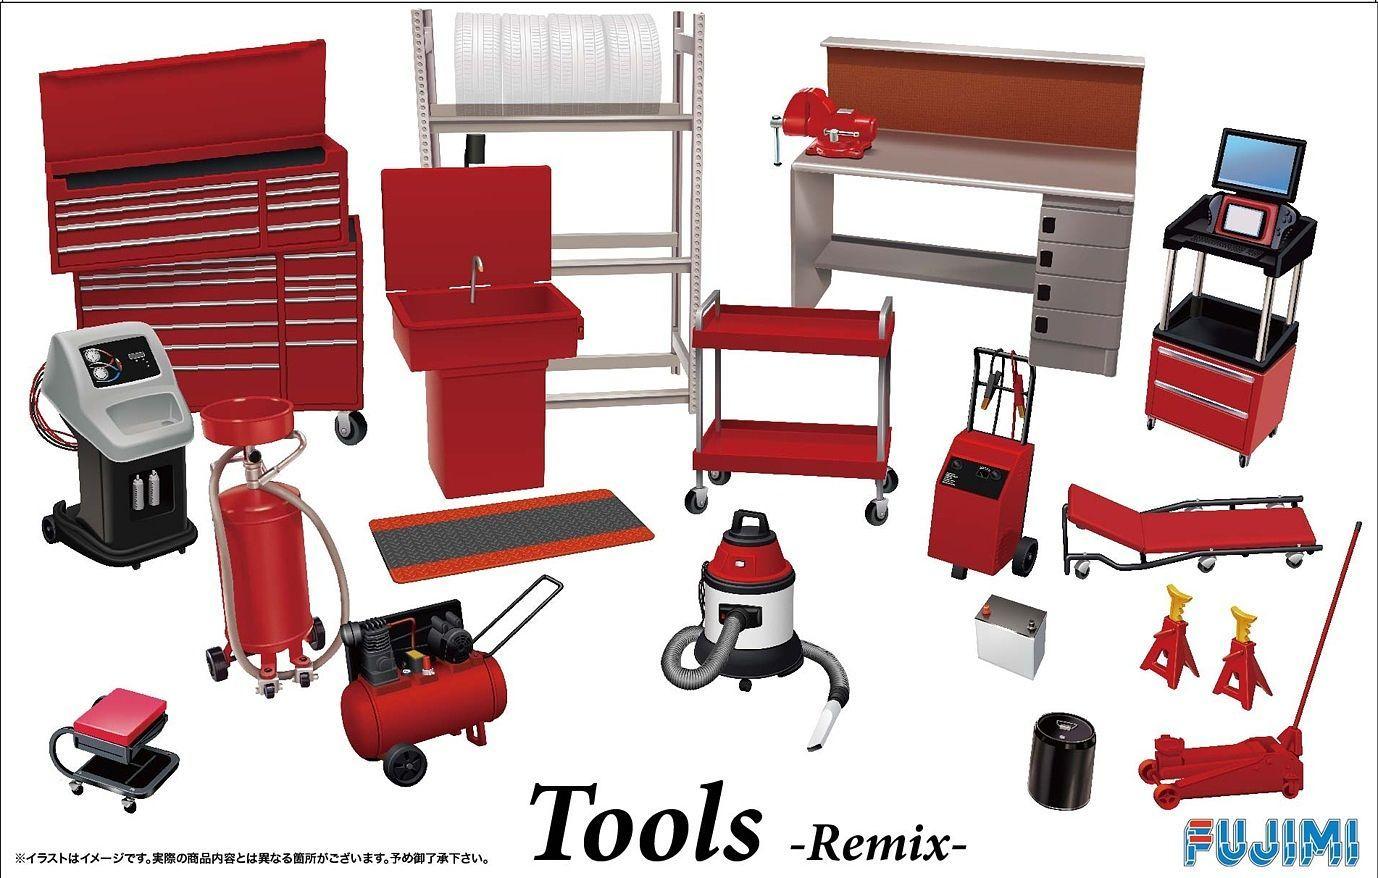 Fujimi Tools remix